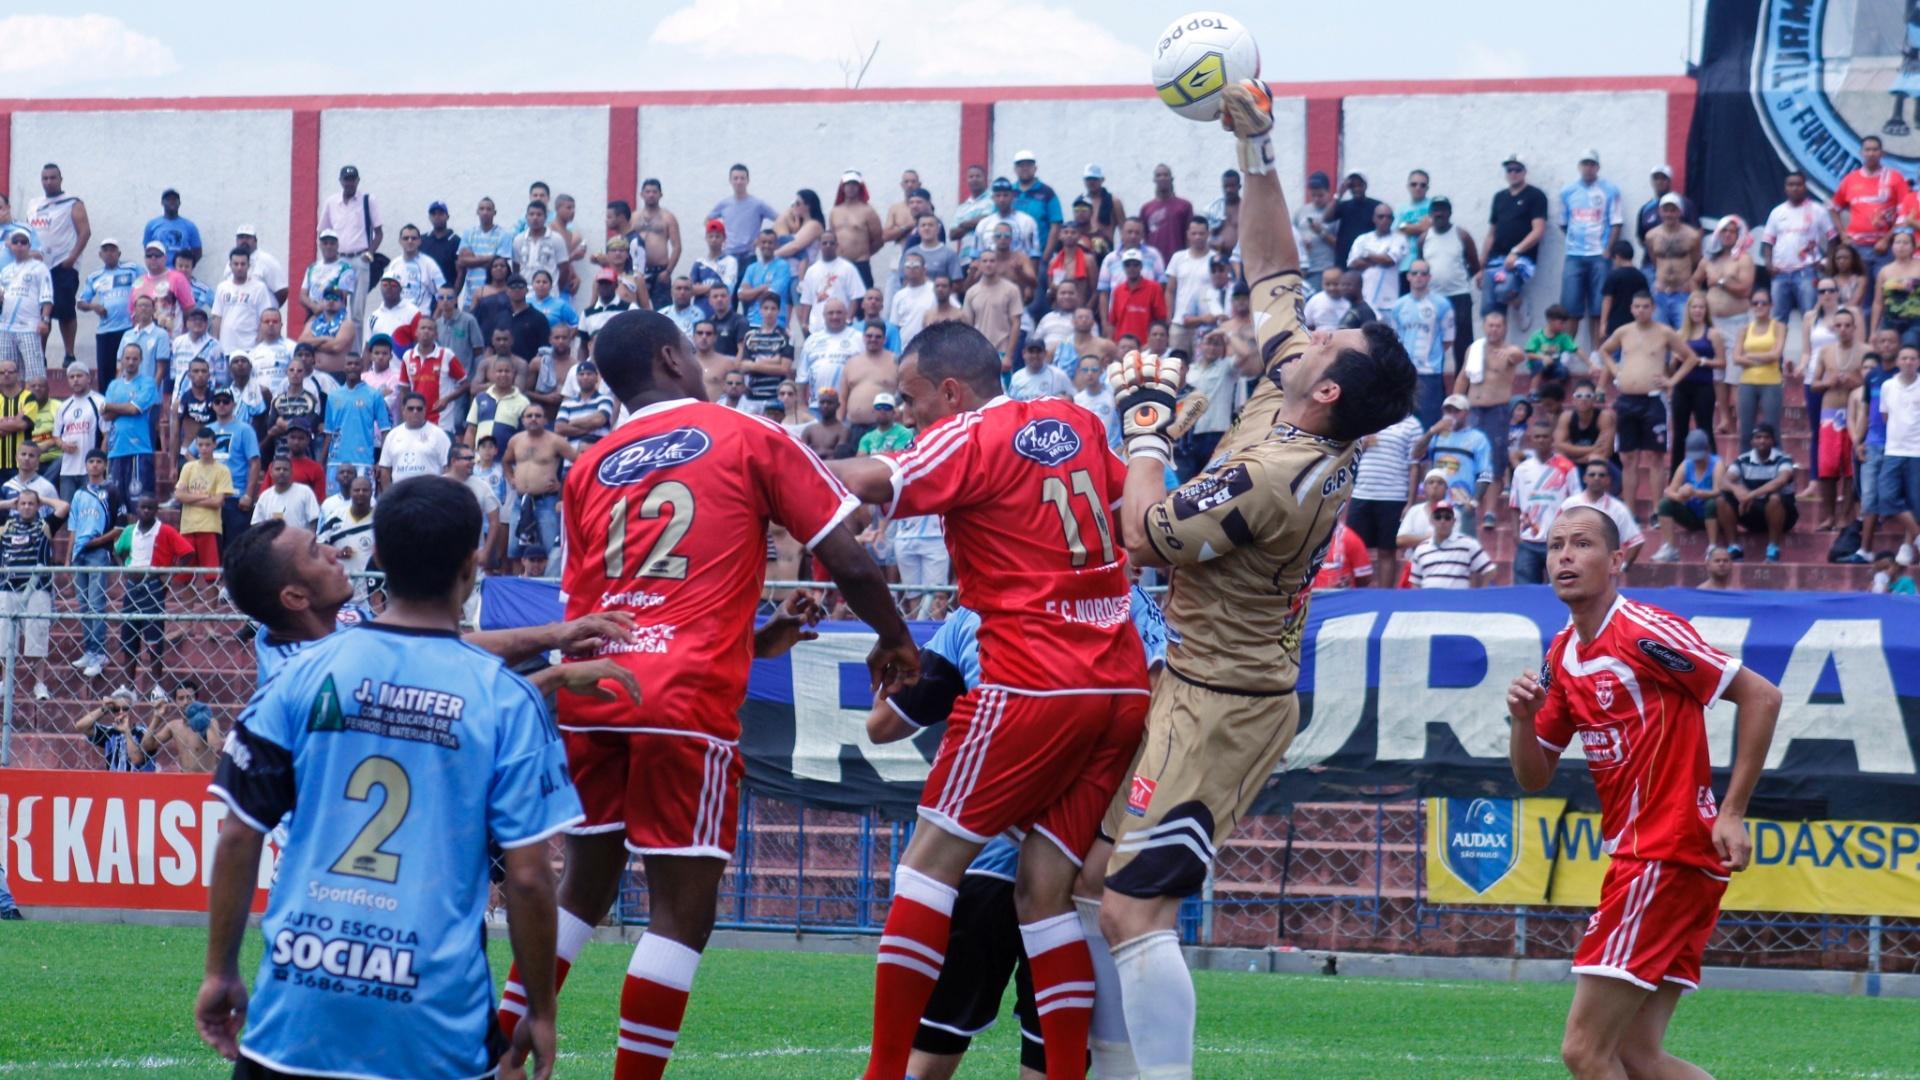 Dentro da área, jogadores de Turma do Baffo (de azul) e Noroeste disputam pela bola durante semifinal da Copa Kaiser